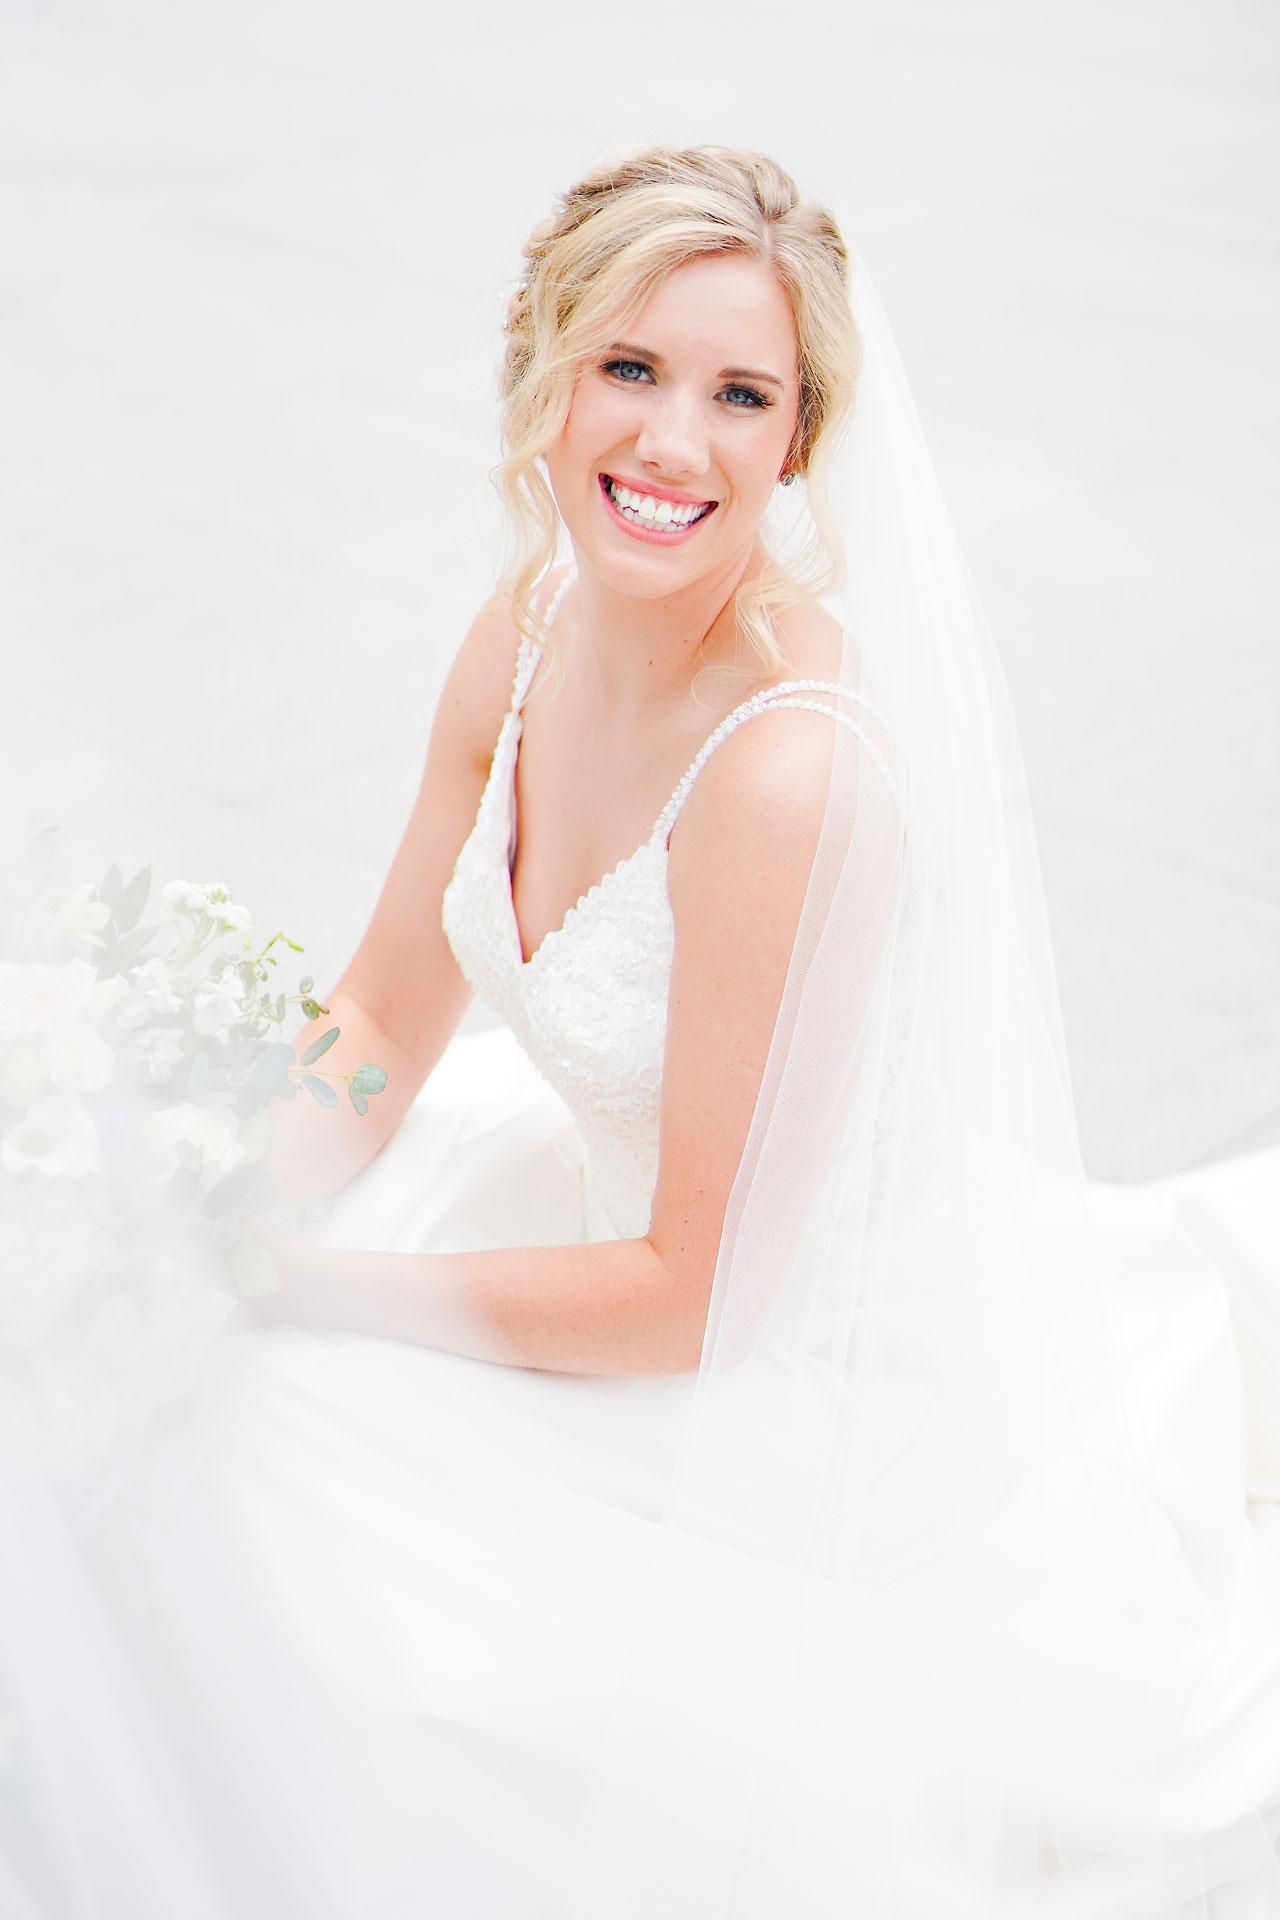 Sammi Jack Regions Tower JPS Events Indianapolis Wedding 112